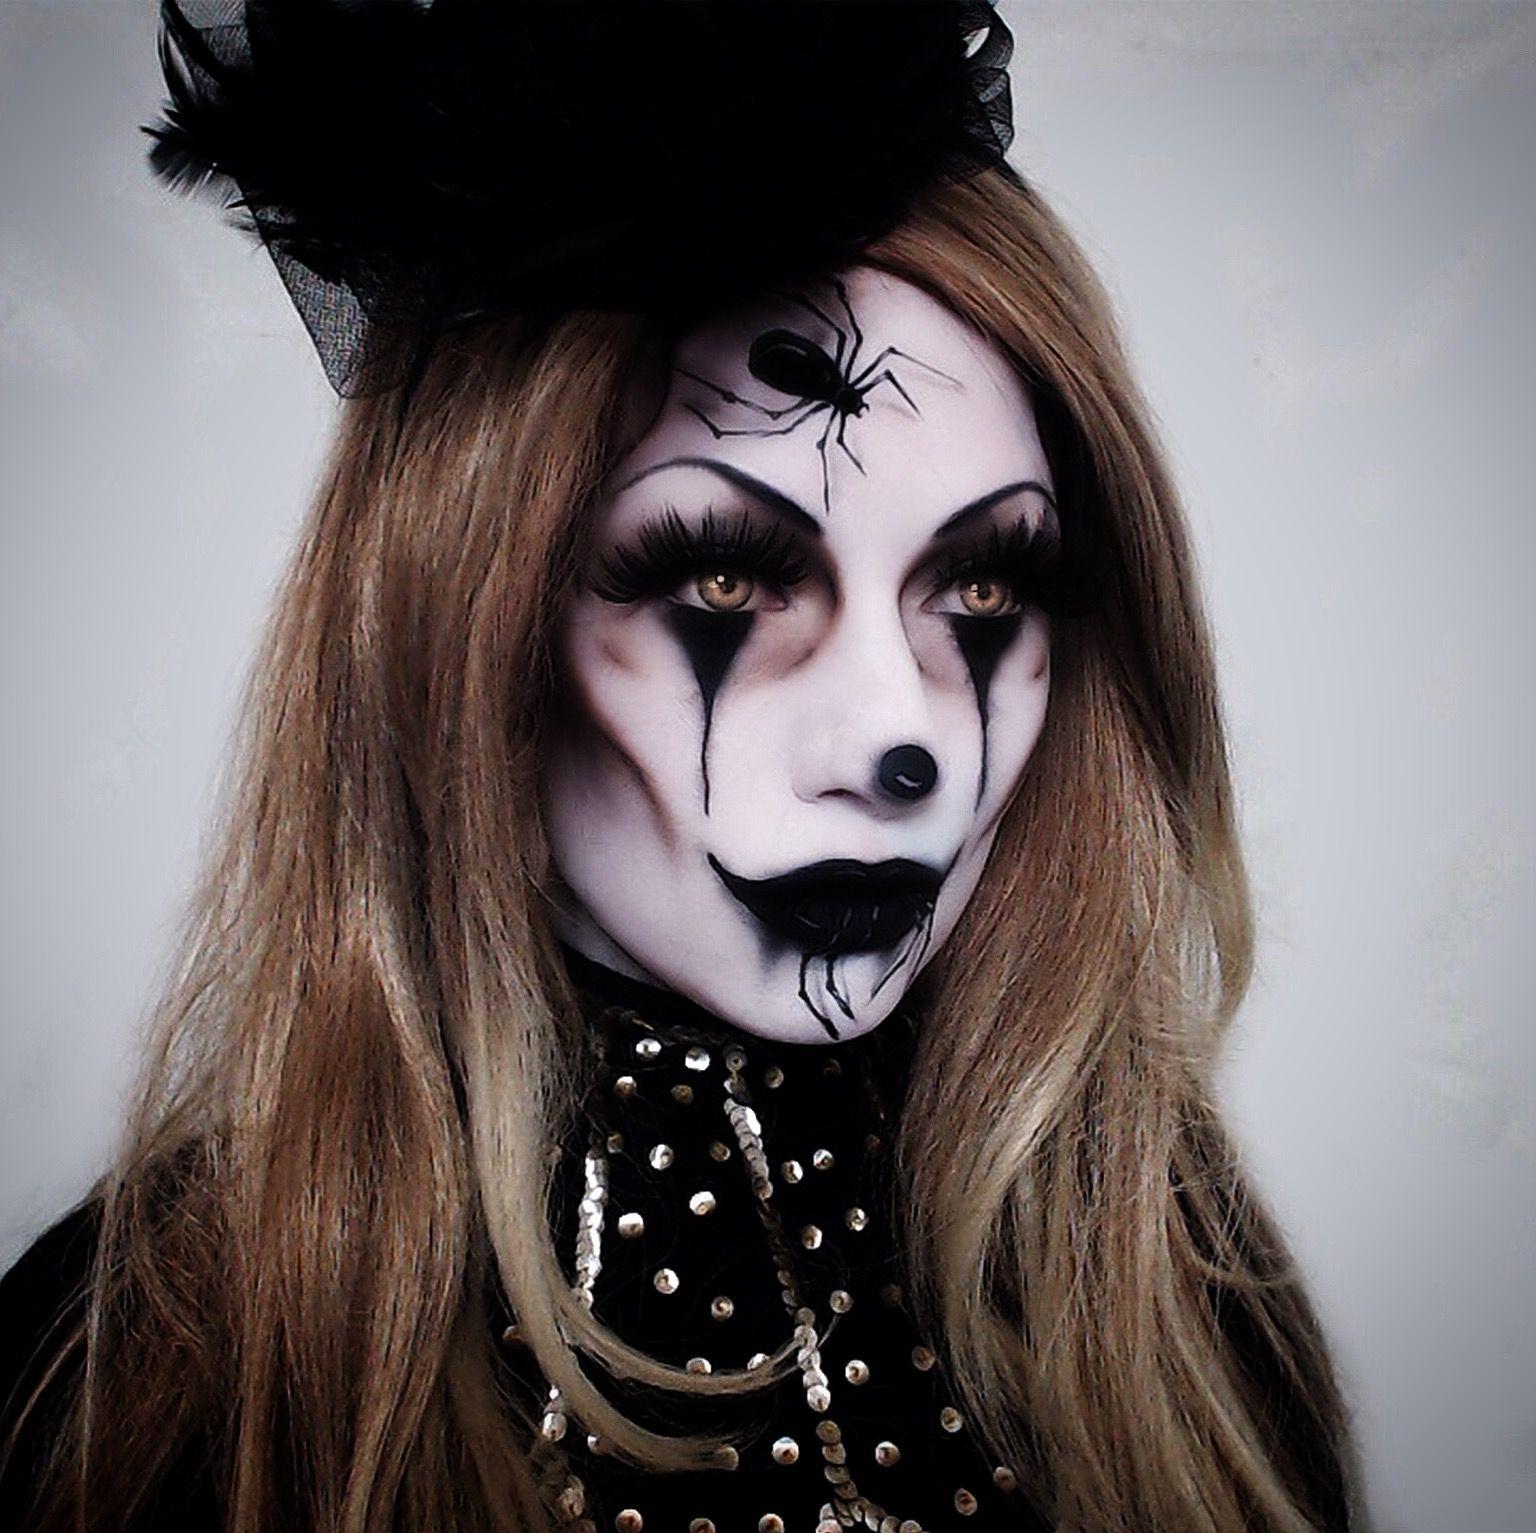 Clown spider Halloween skull makeup costume fx horror